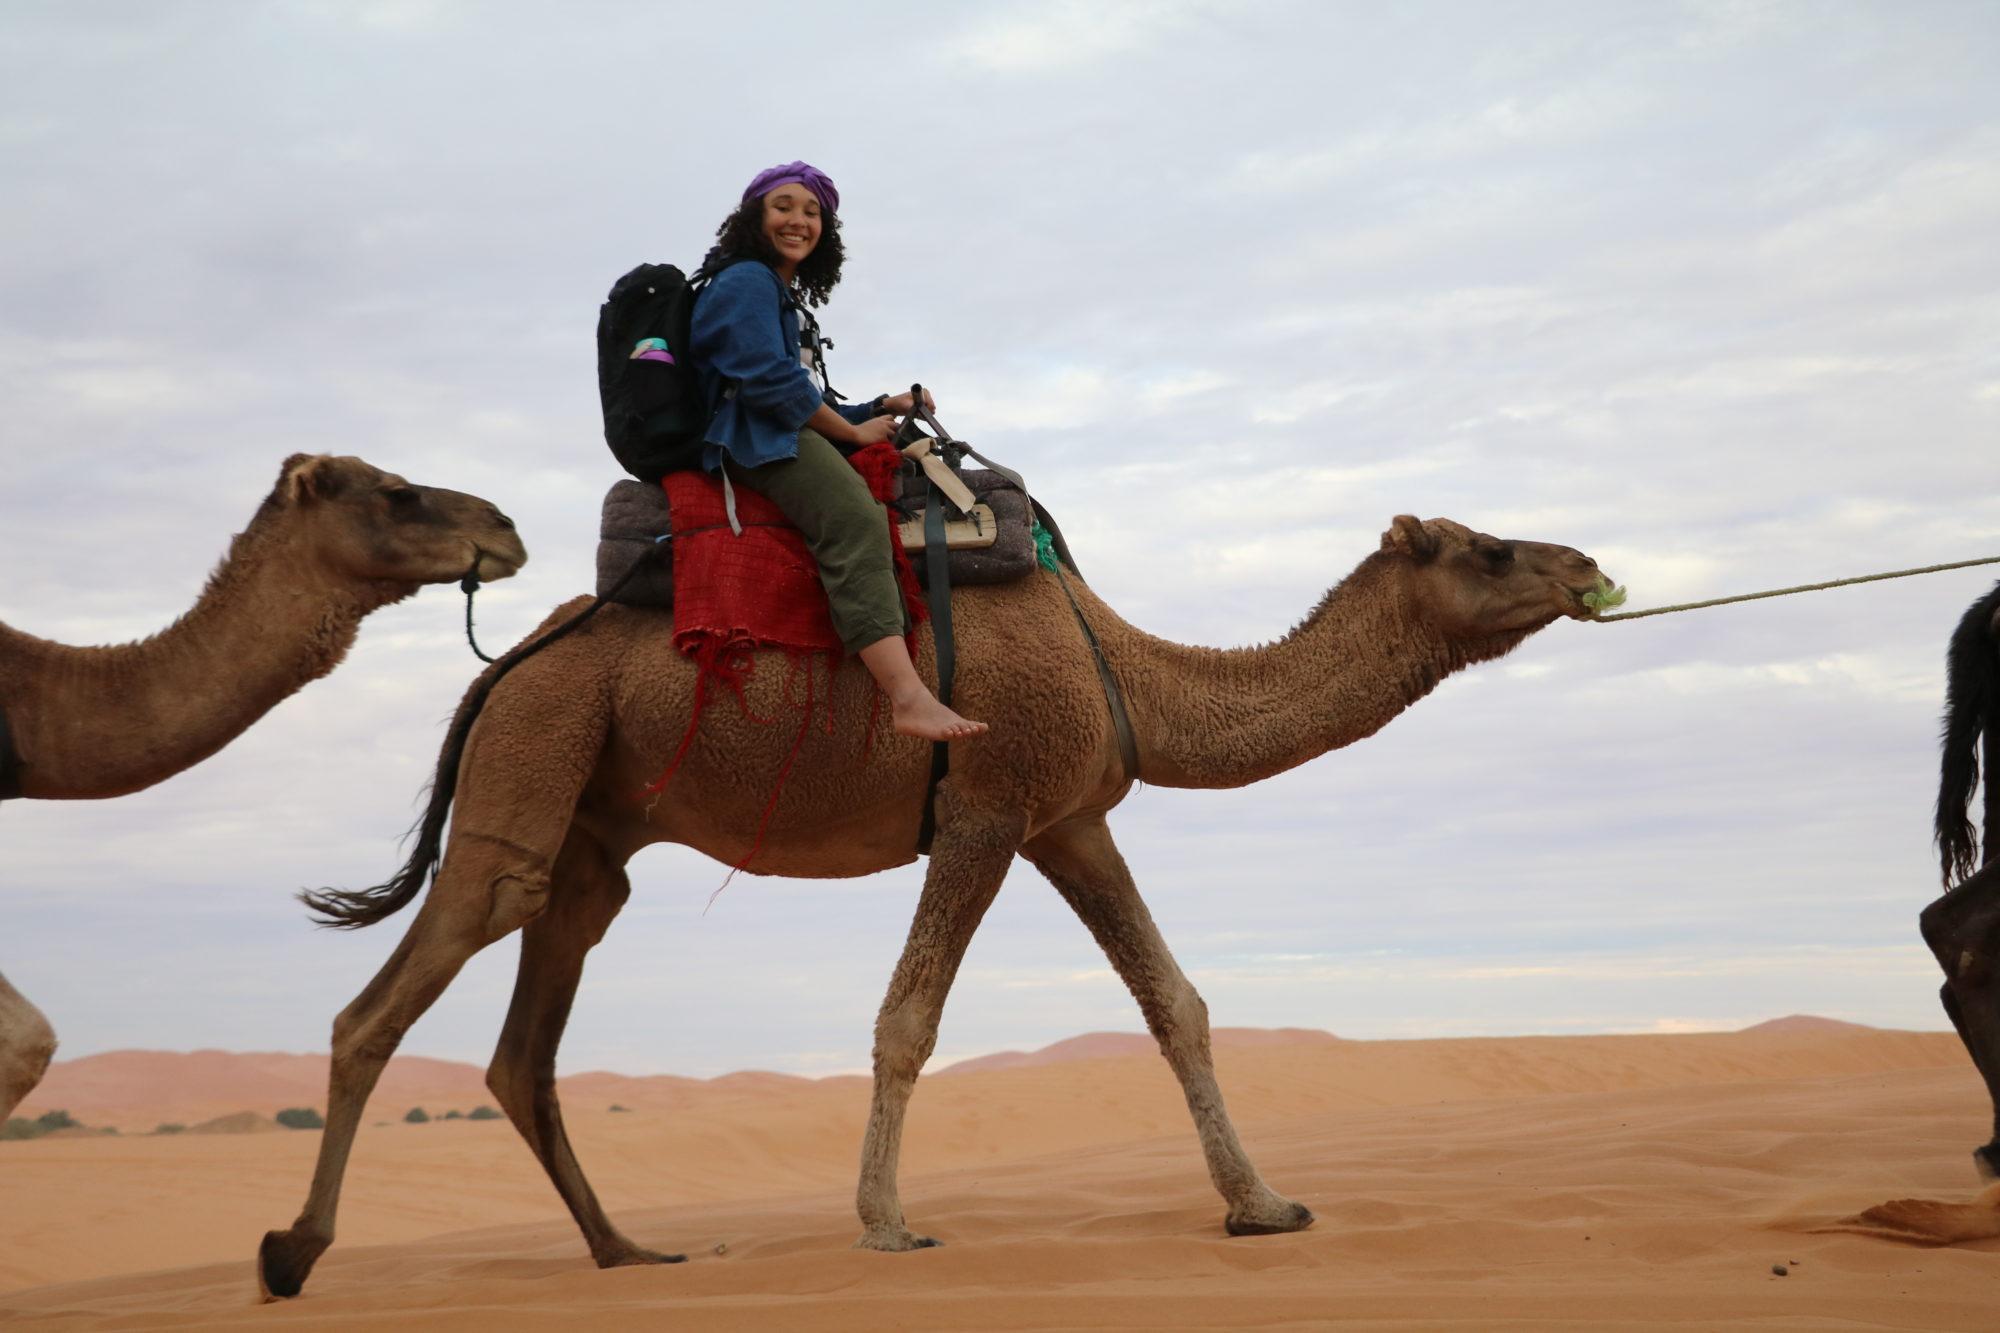 Photo of Alyssa on Camel